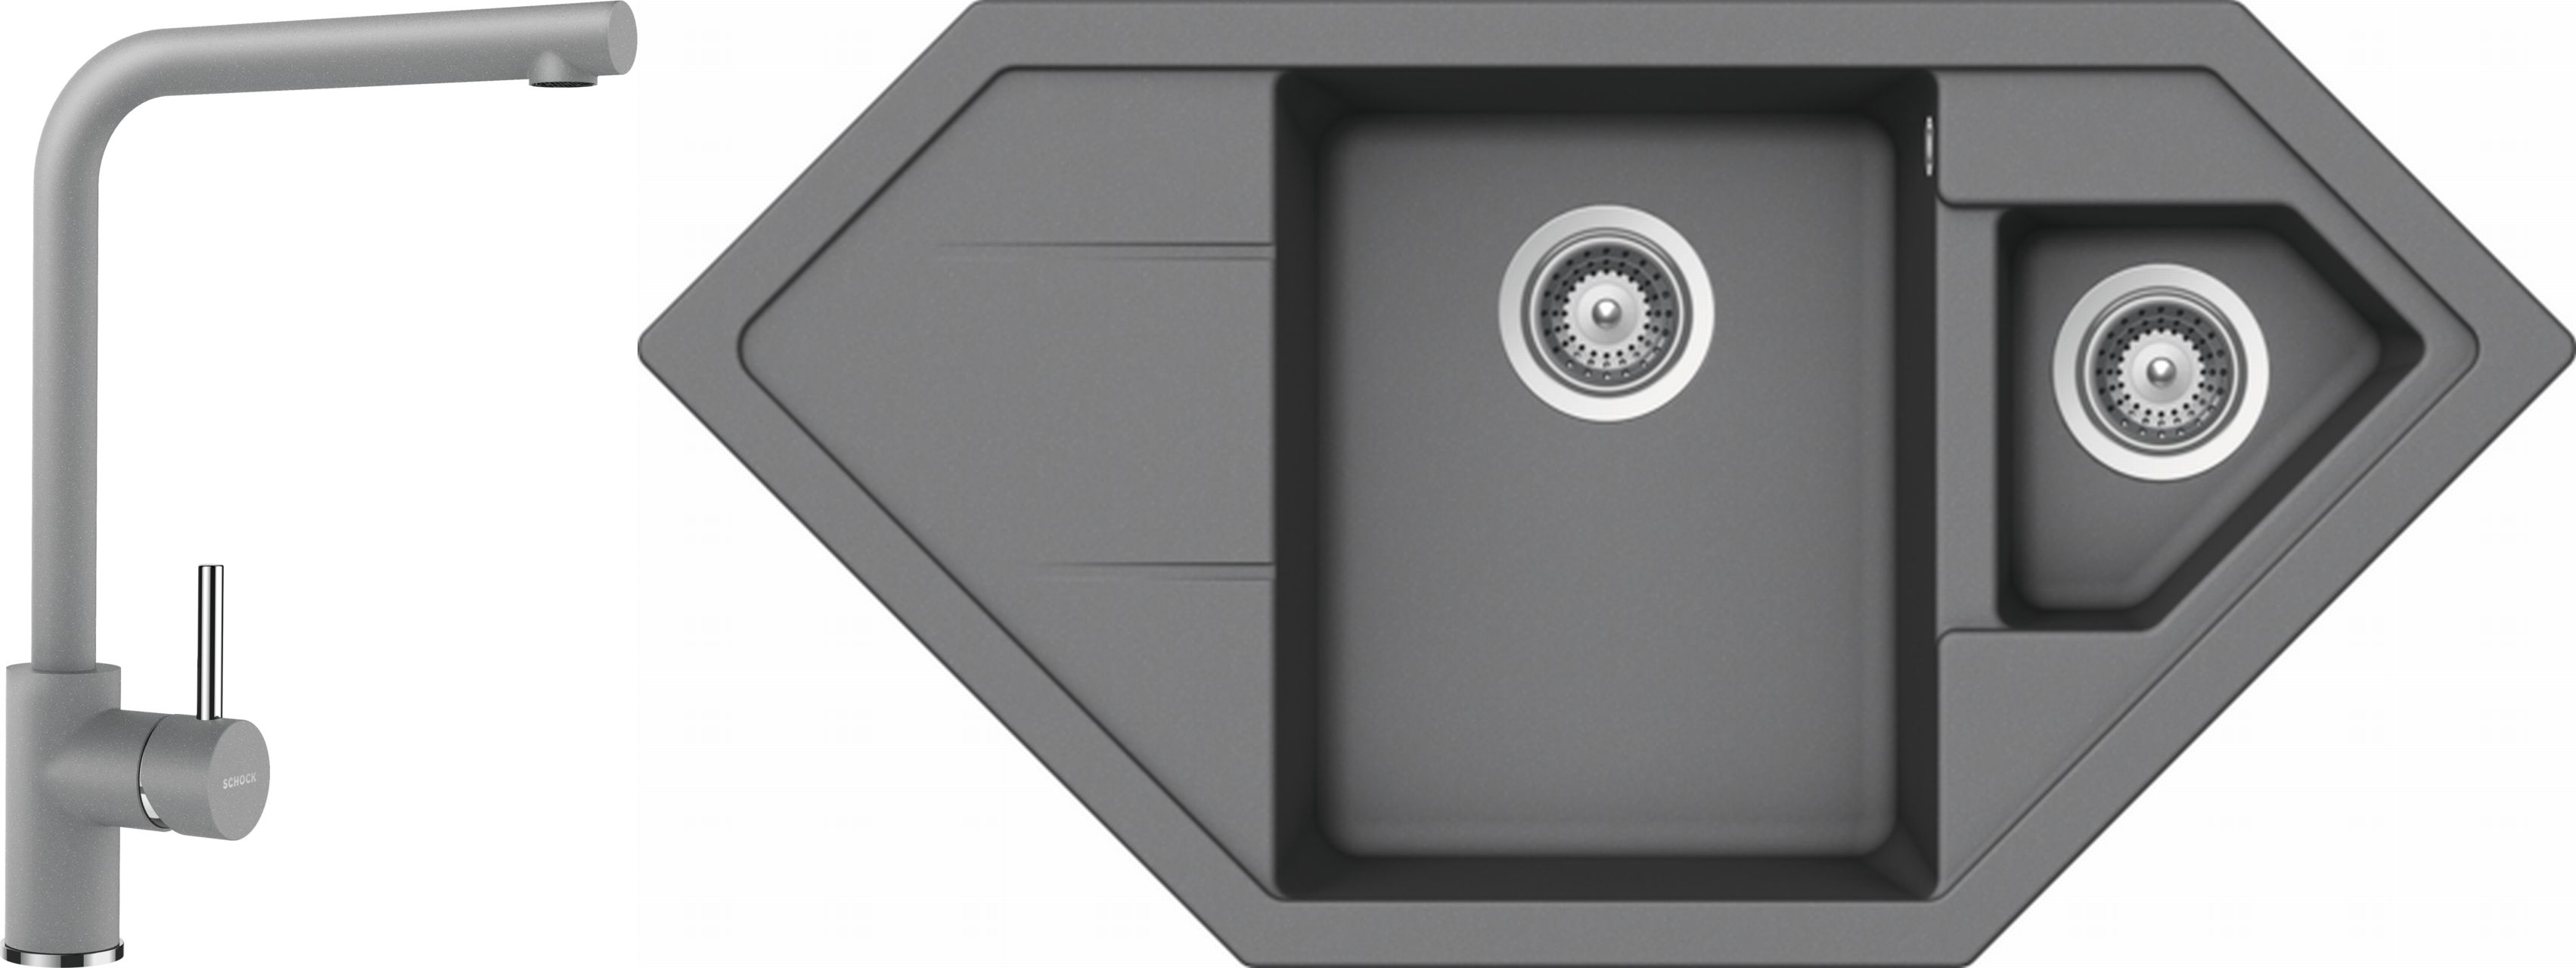 Set 38c Dřez Primus C-150 Croma + kuchyňská baterie Napos Croma